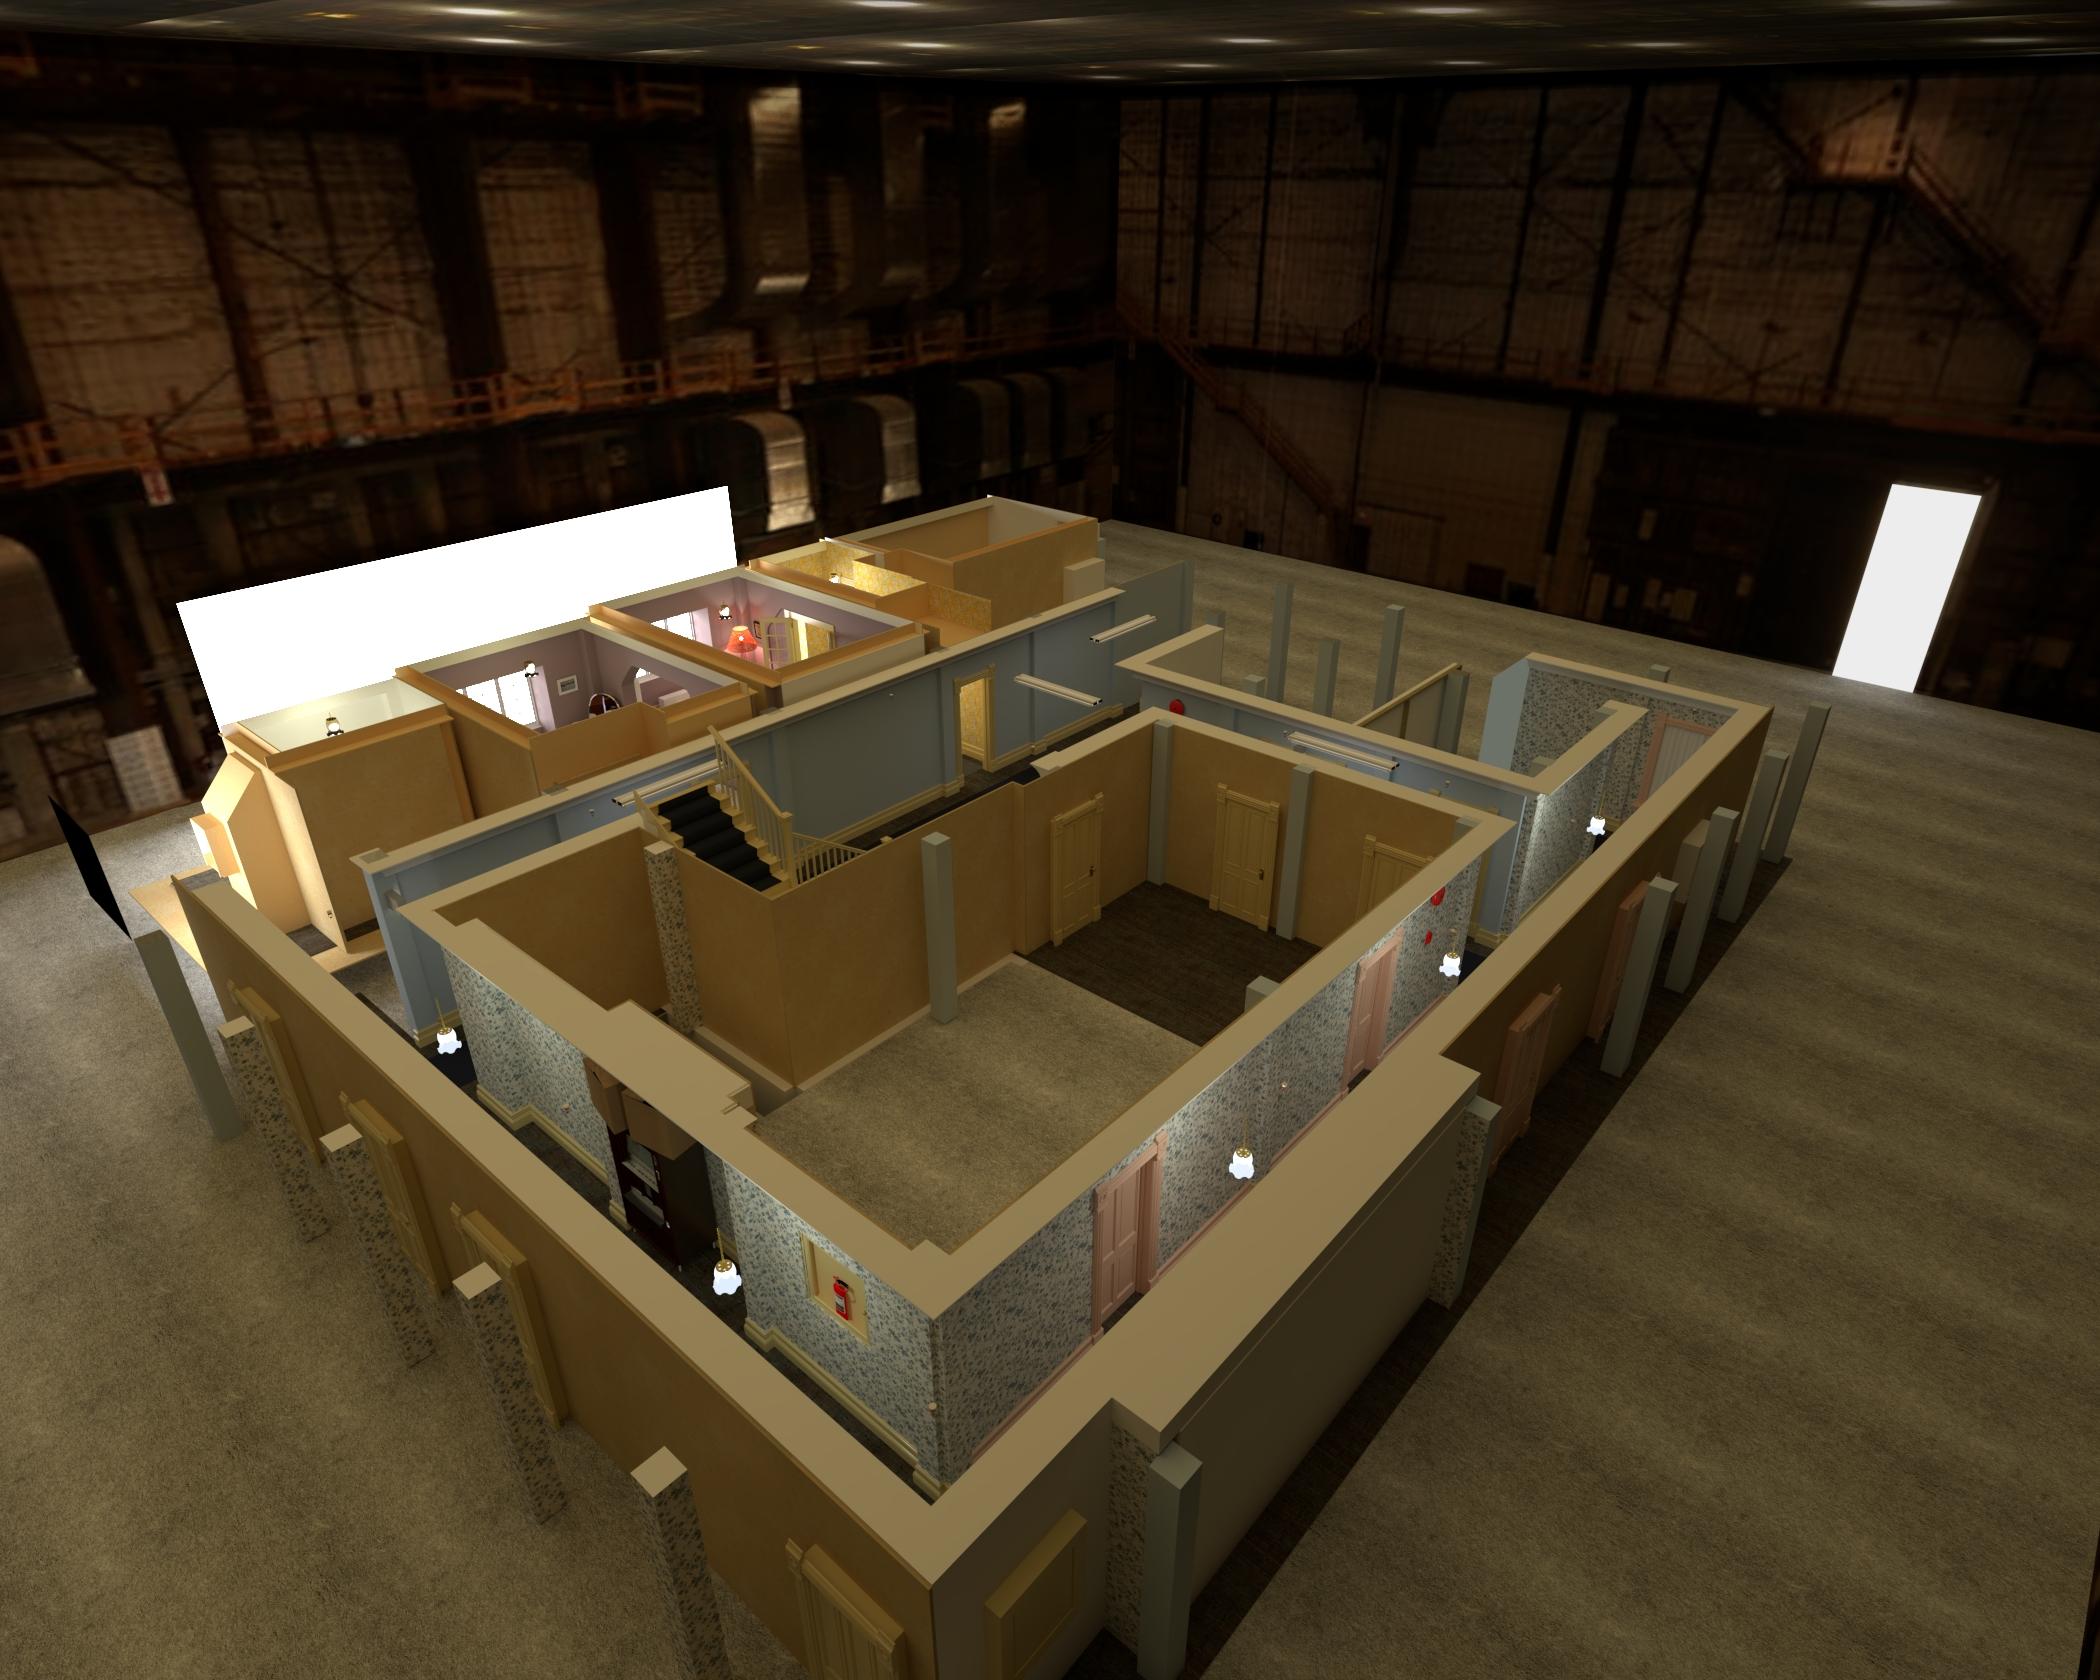 birdview of the apartment set